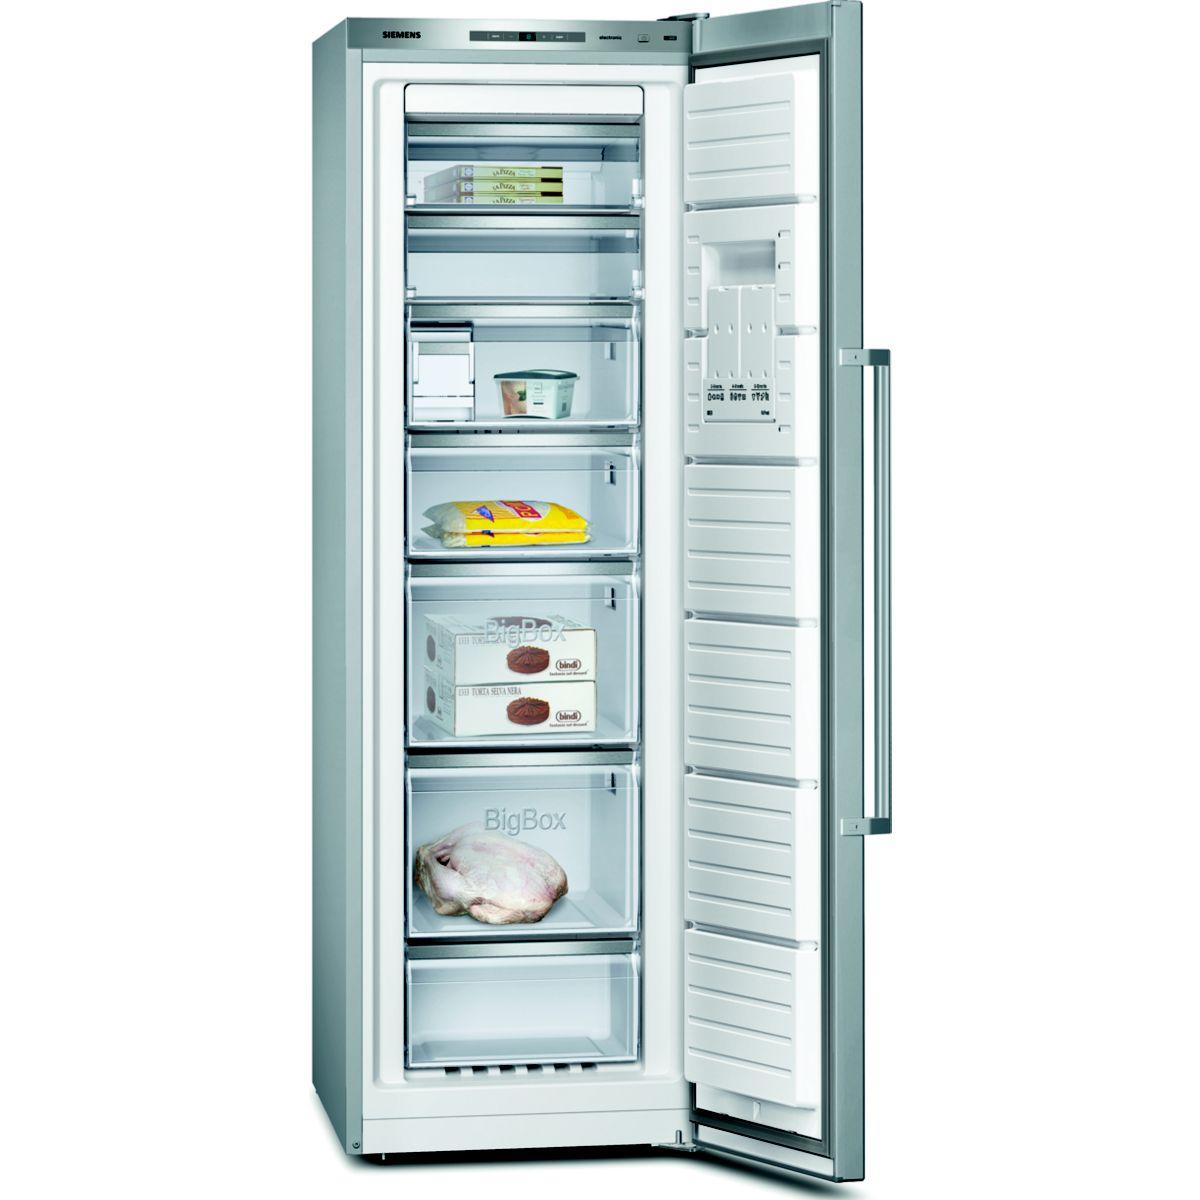 Lectrom nager cong lateur armoire siemens gs36nai31 - Test congelateur armoire ...